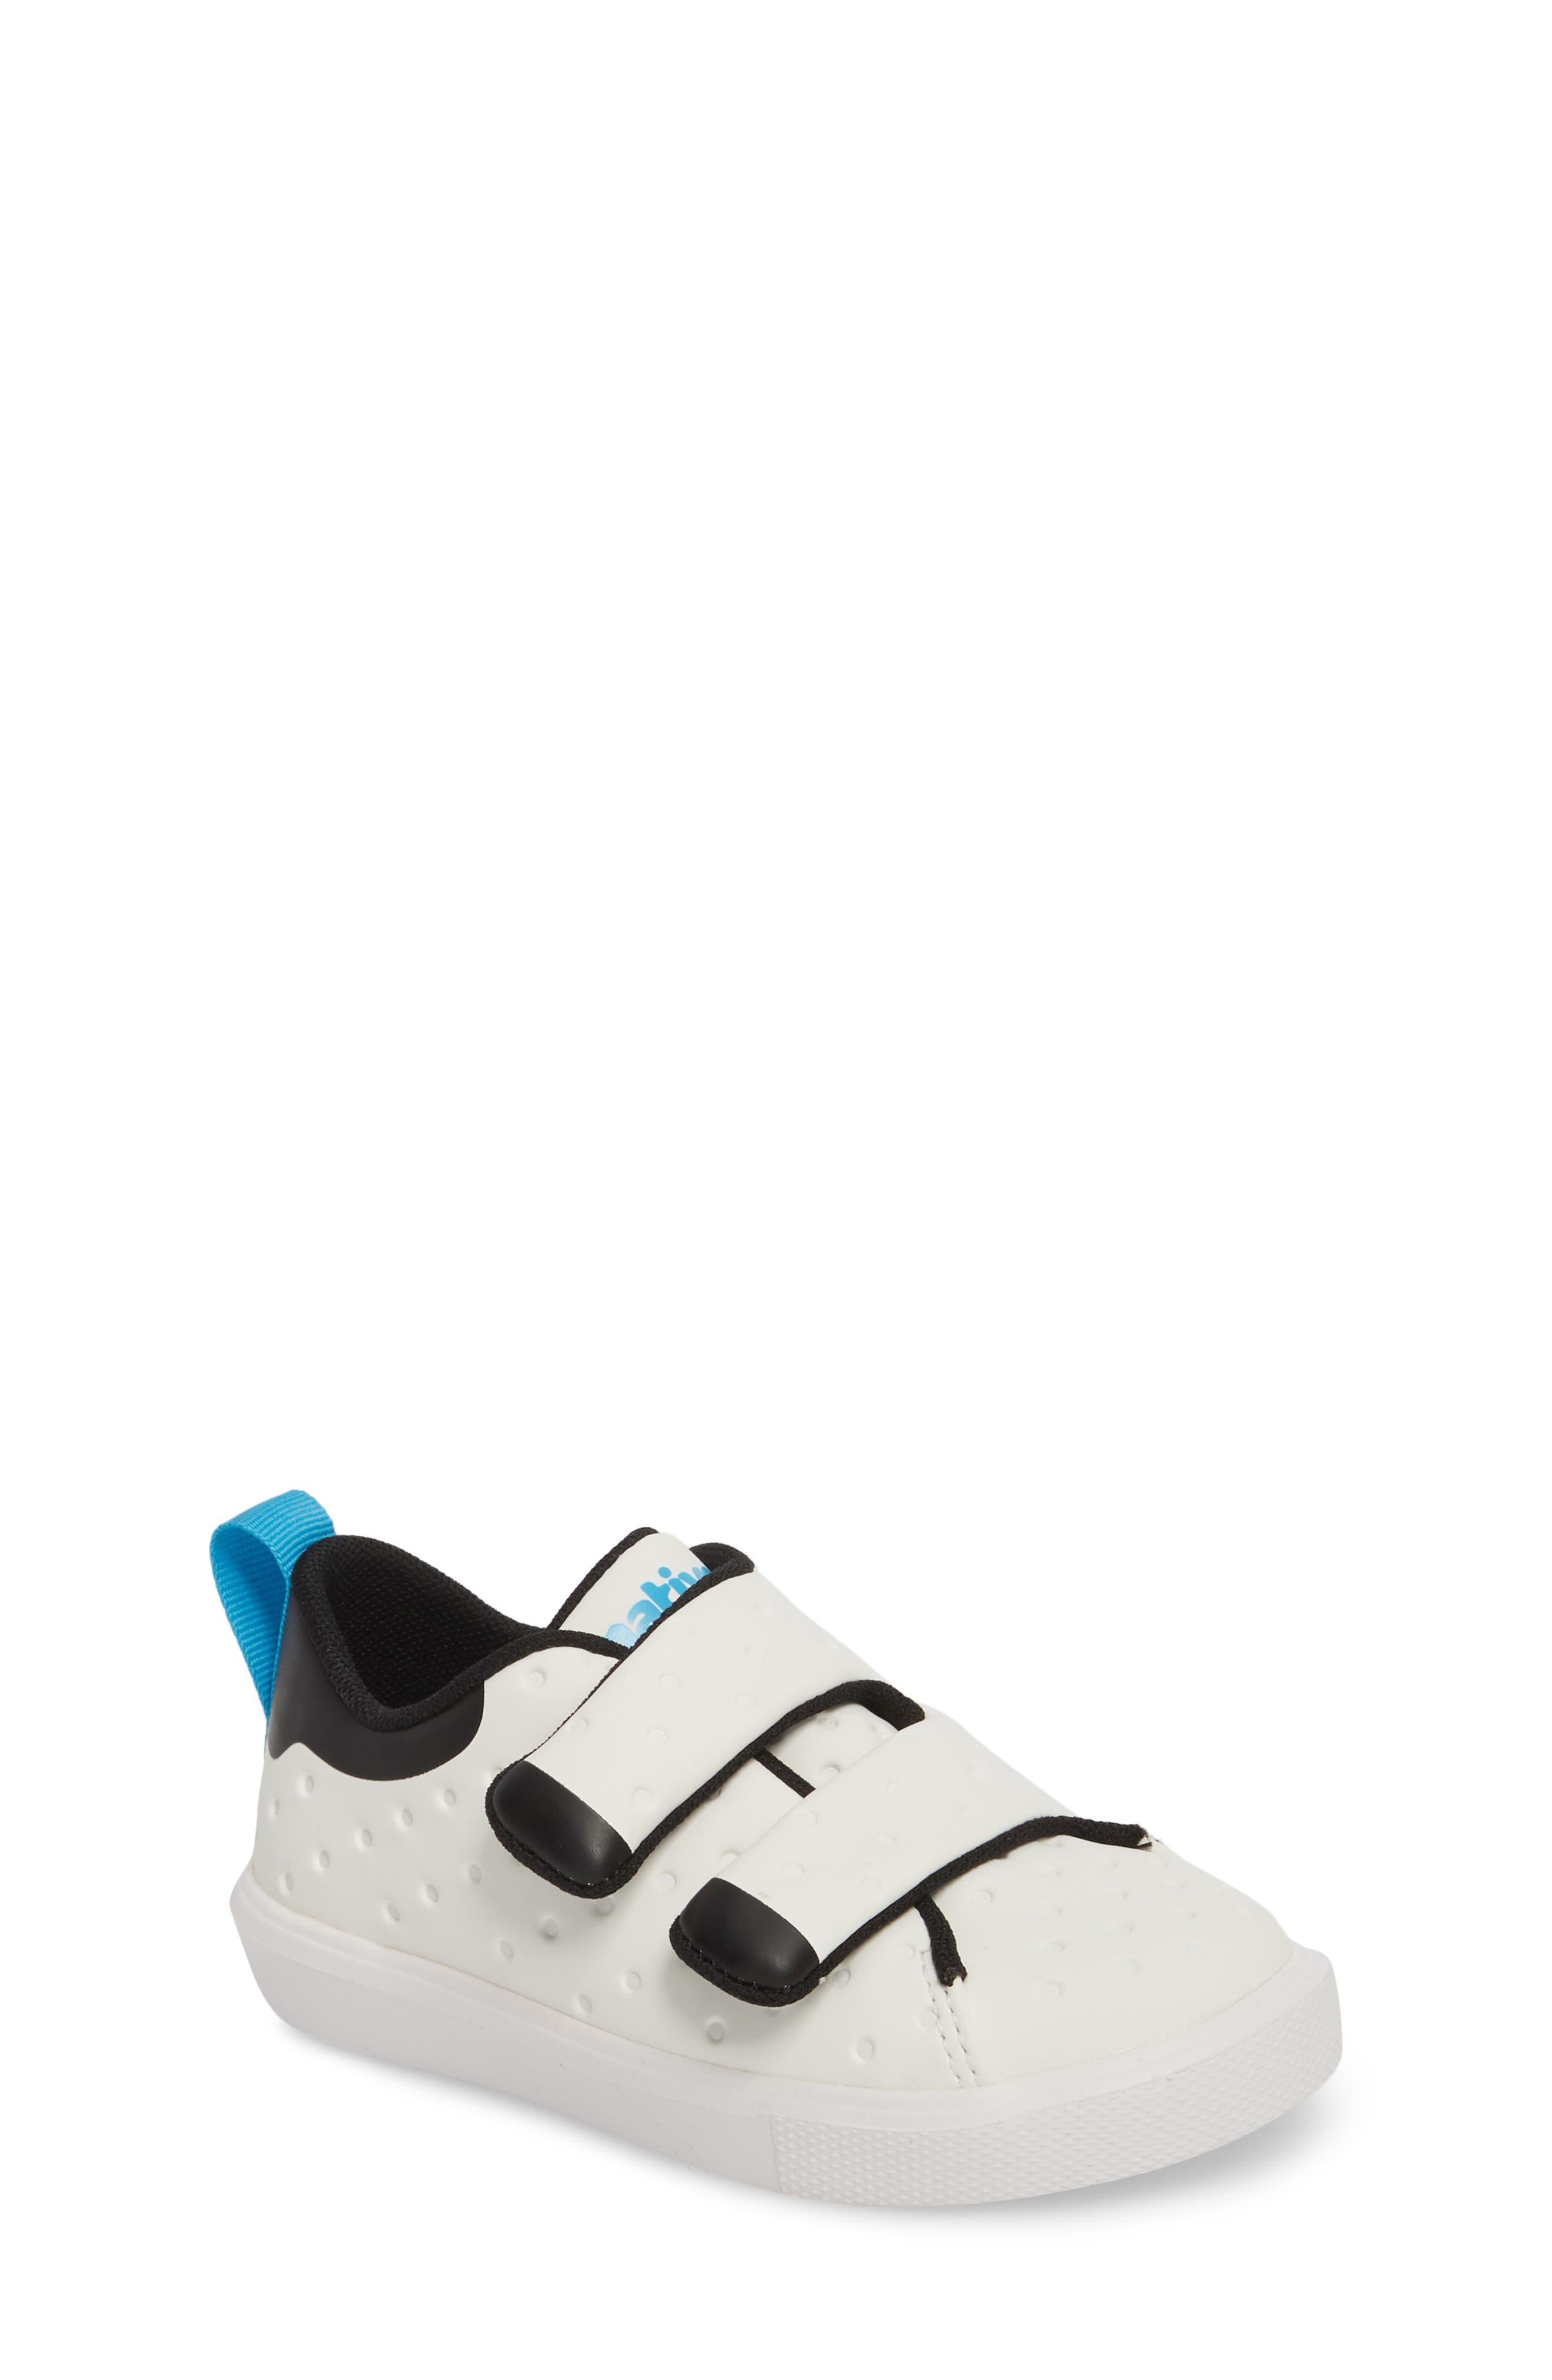 Monaco Sneaker,                             Main thumbnail 1, color,                             SHELL WHITE/ JIFFY BLACK